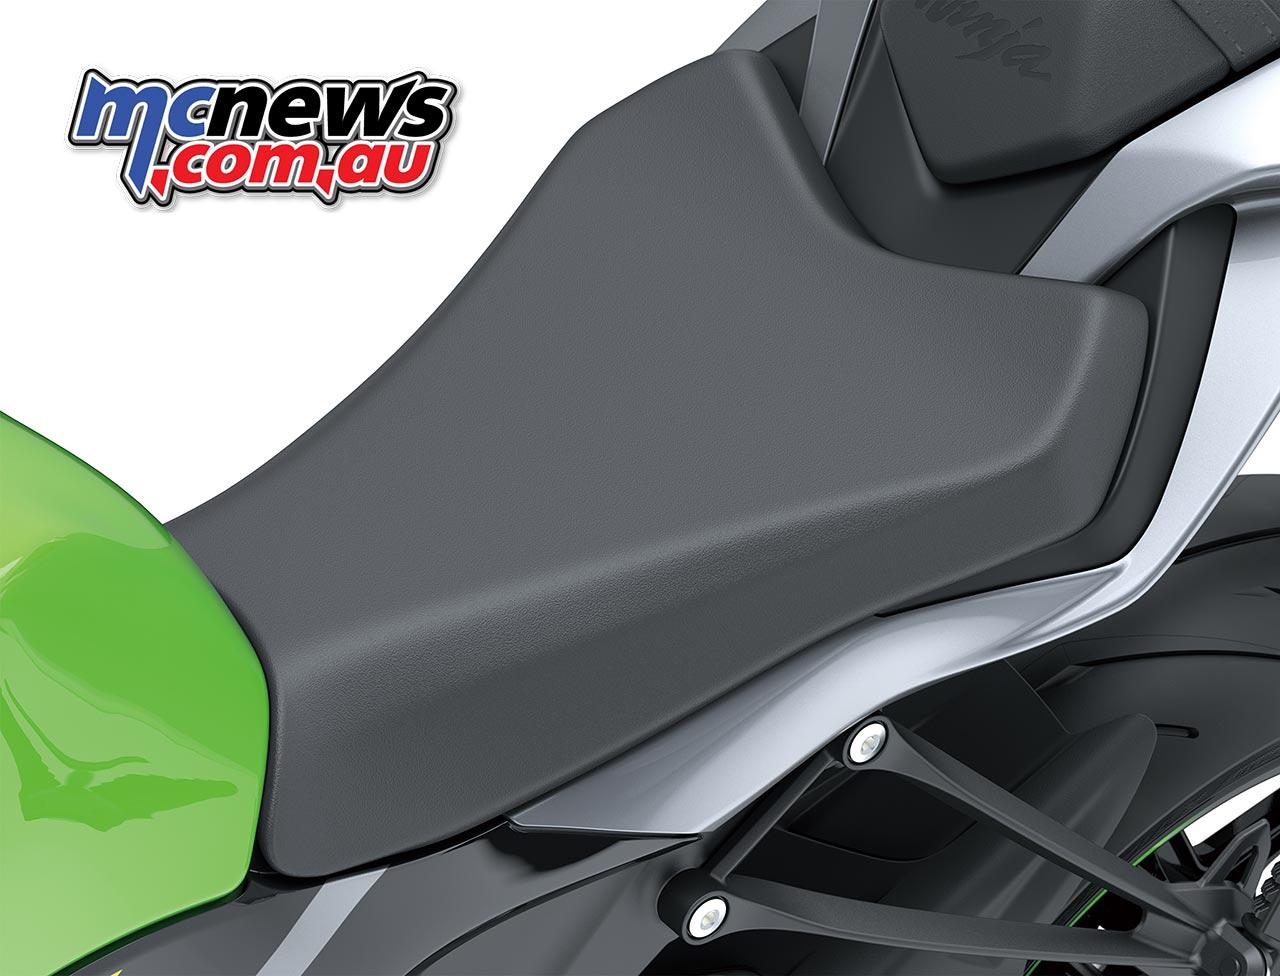 Kawasaki's 636cc ZX-6R gets fresh new look/tech for 2019